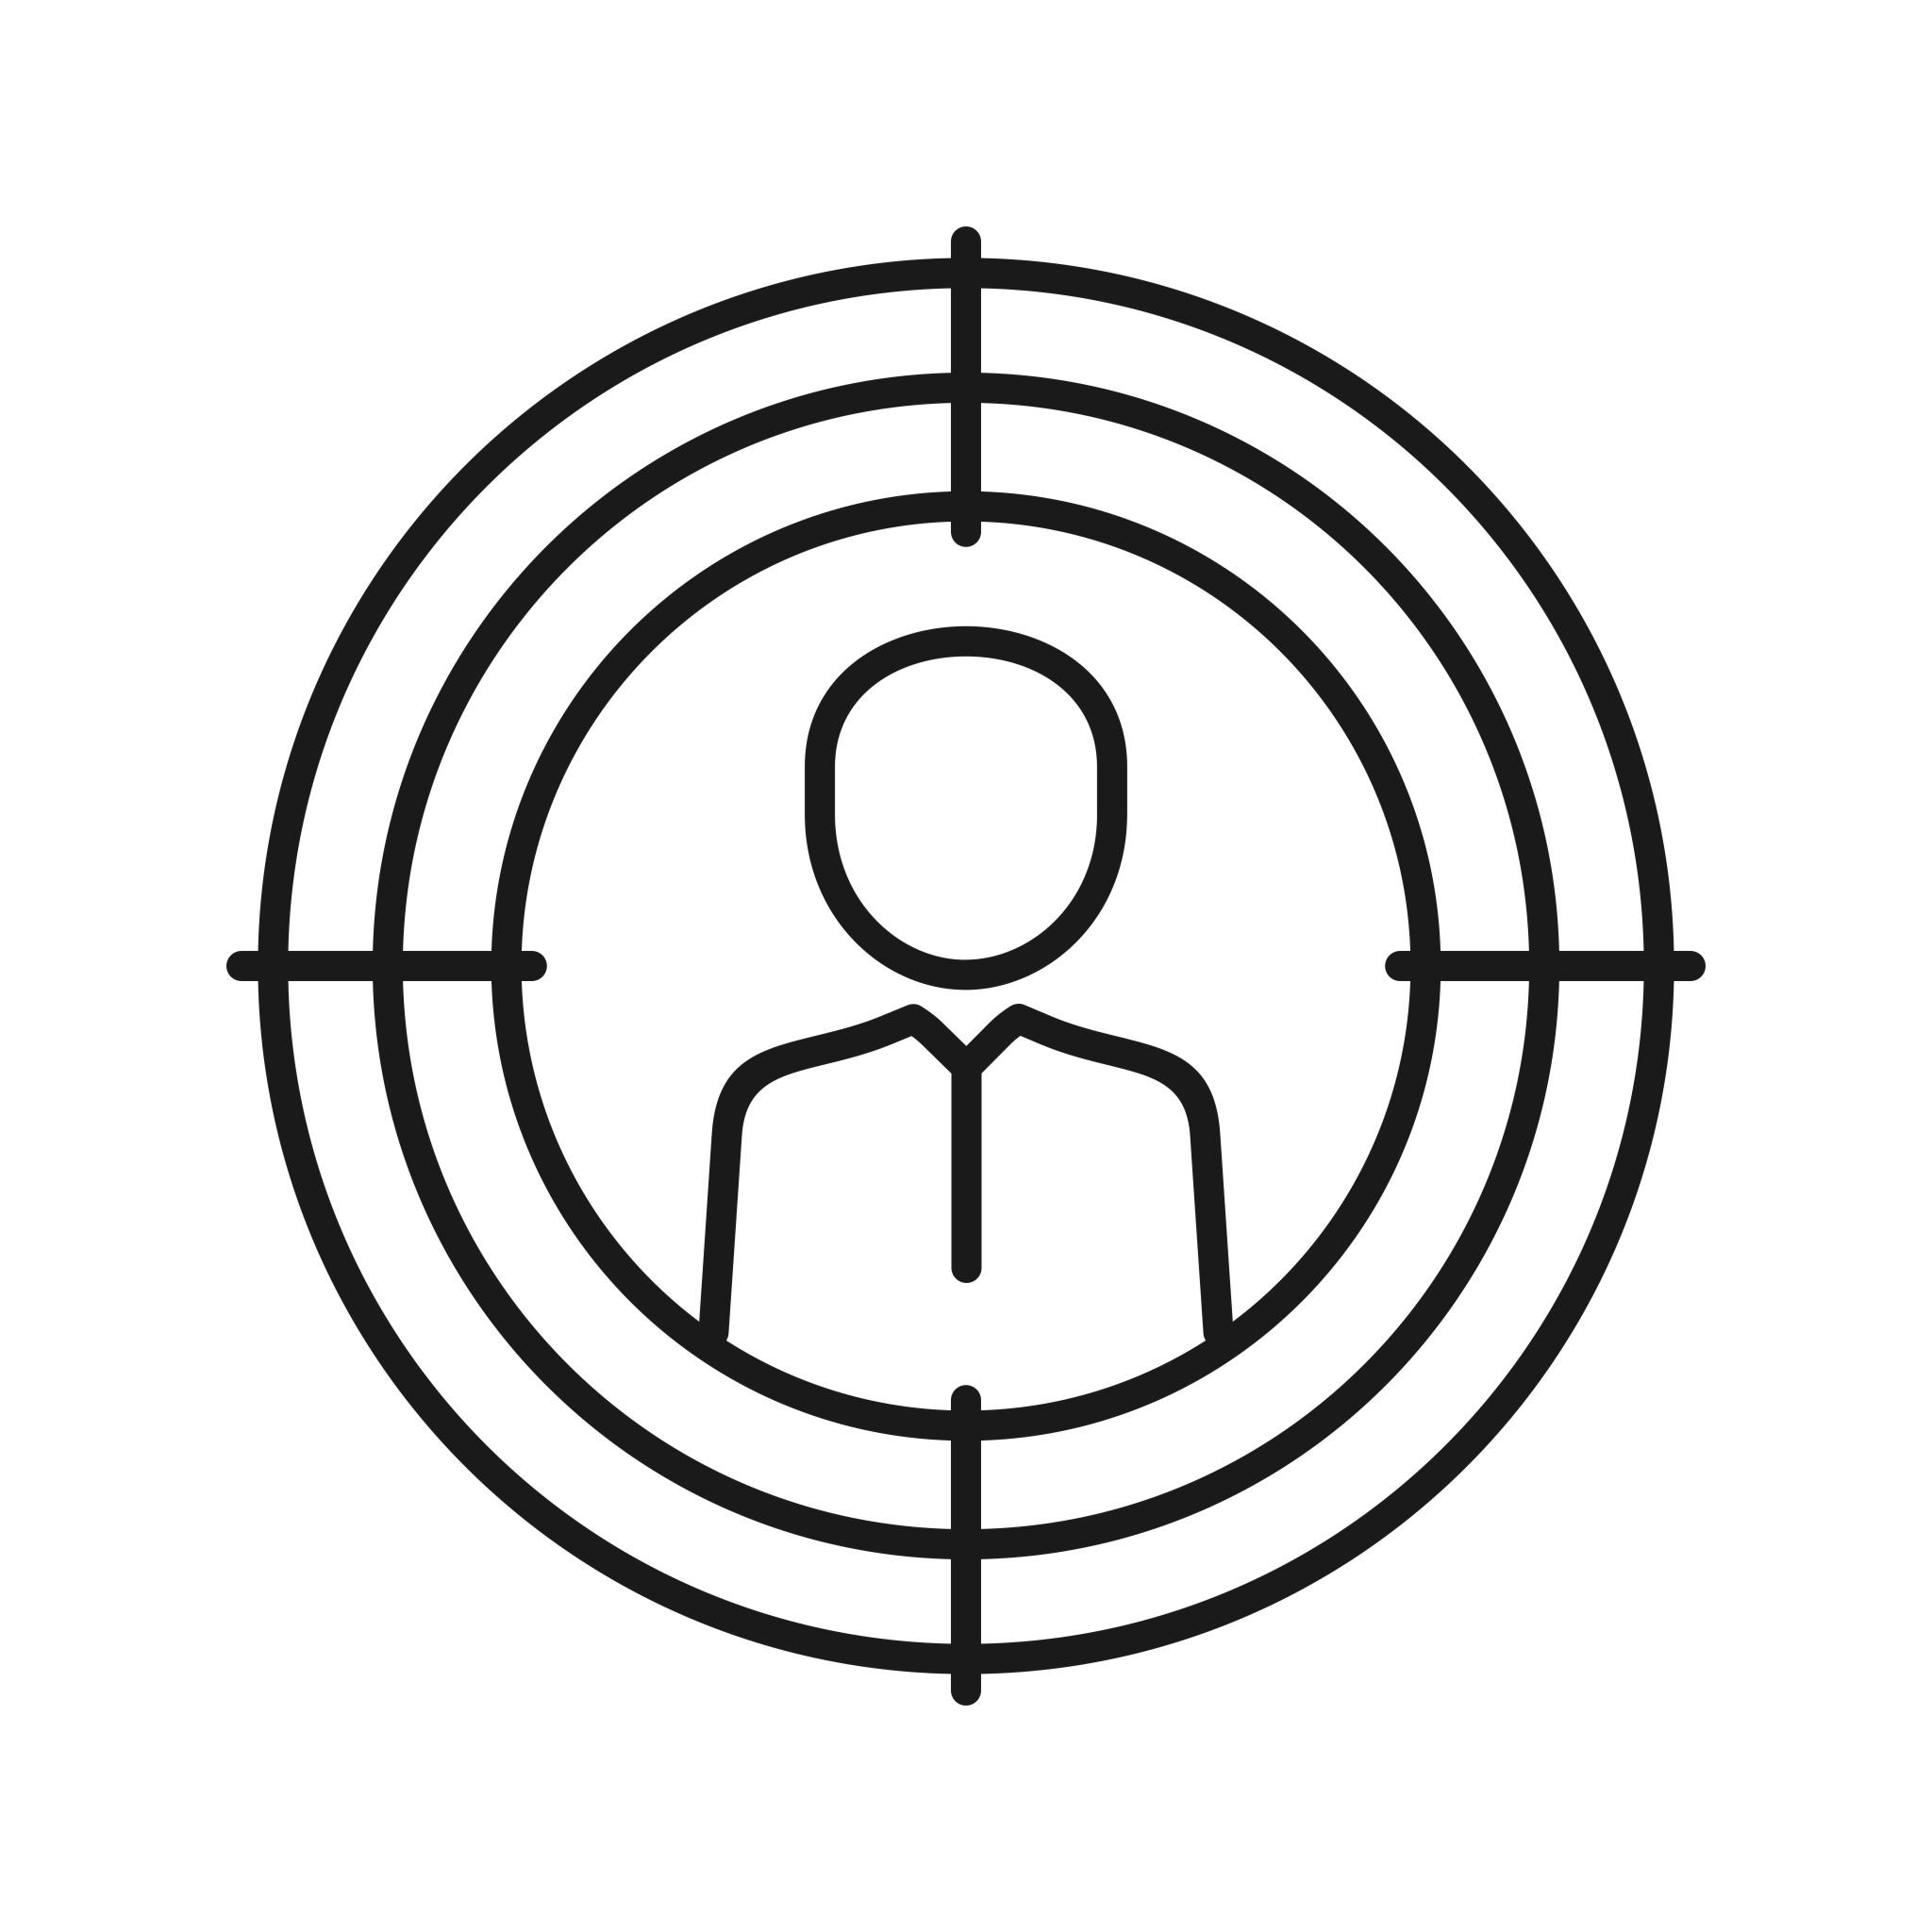 Target Marketing Seo Line Icons